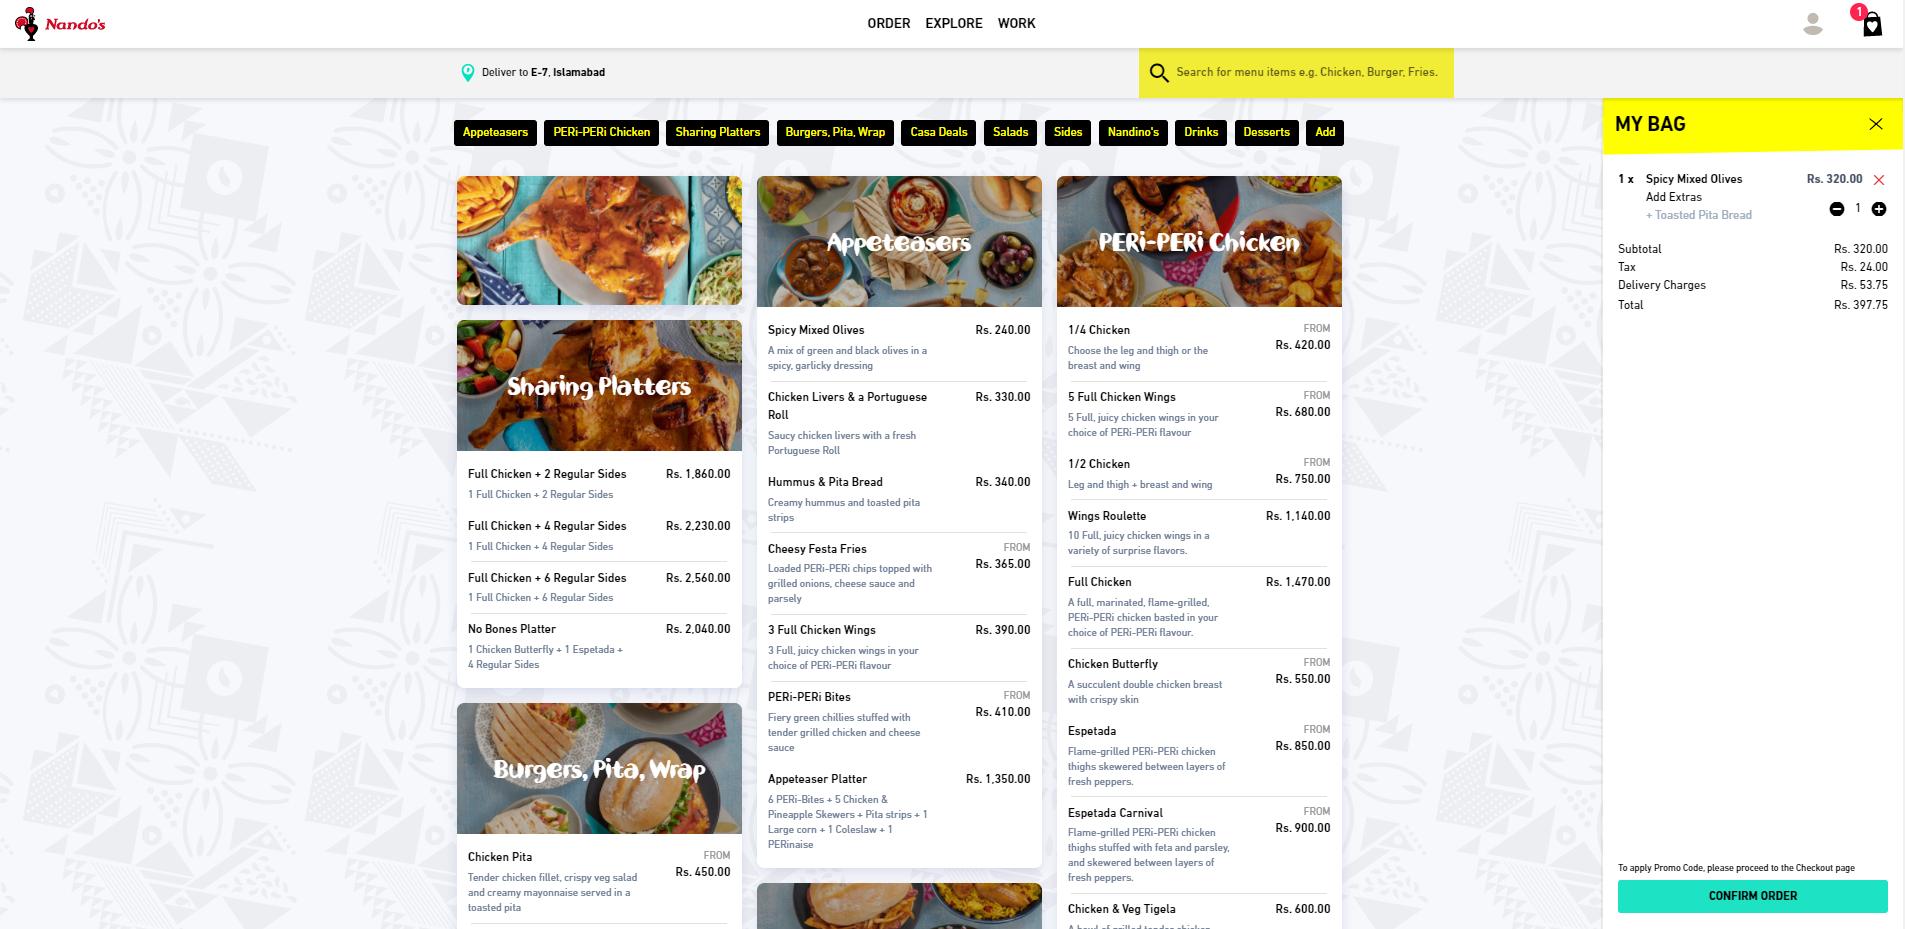 Nandos Pakistan - Ordering Website powered by Blink